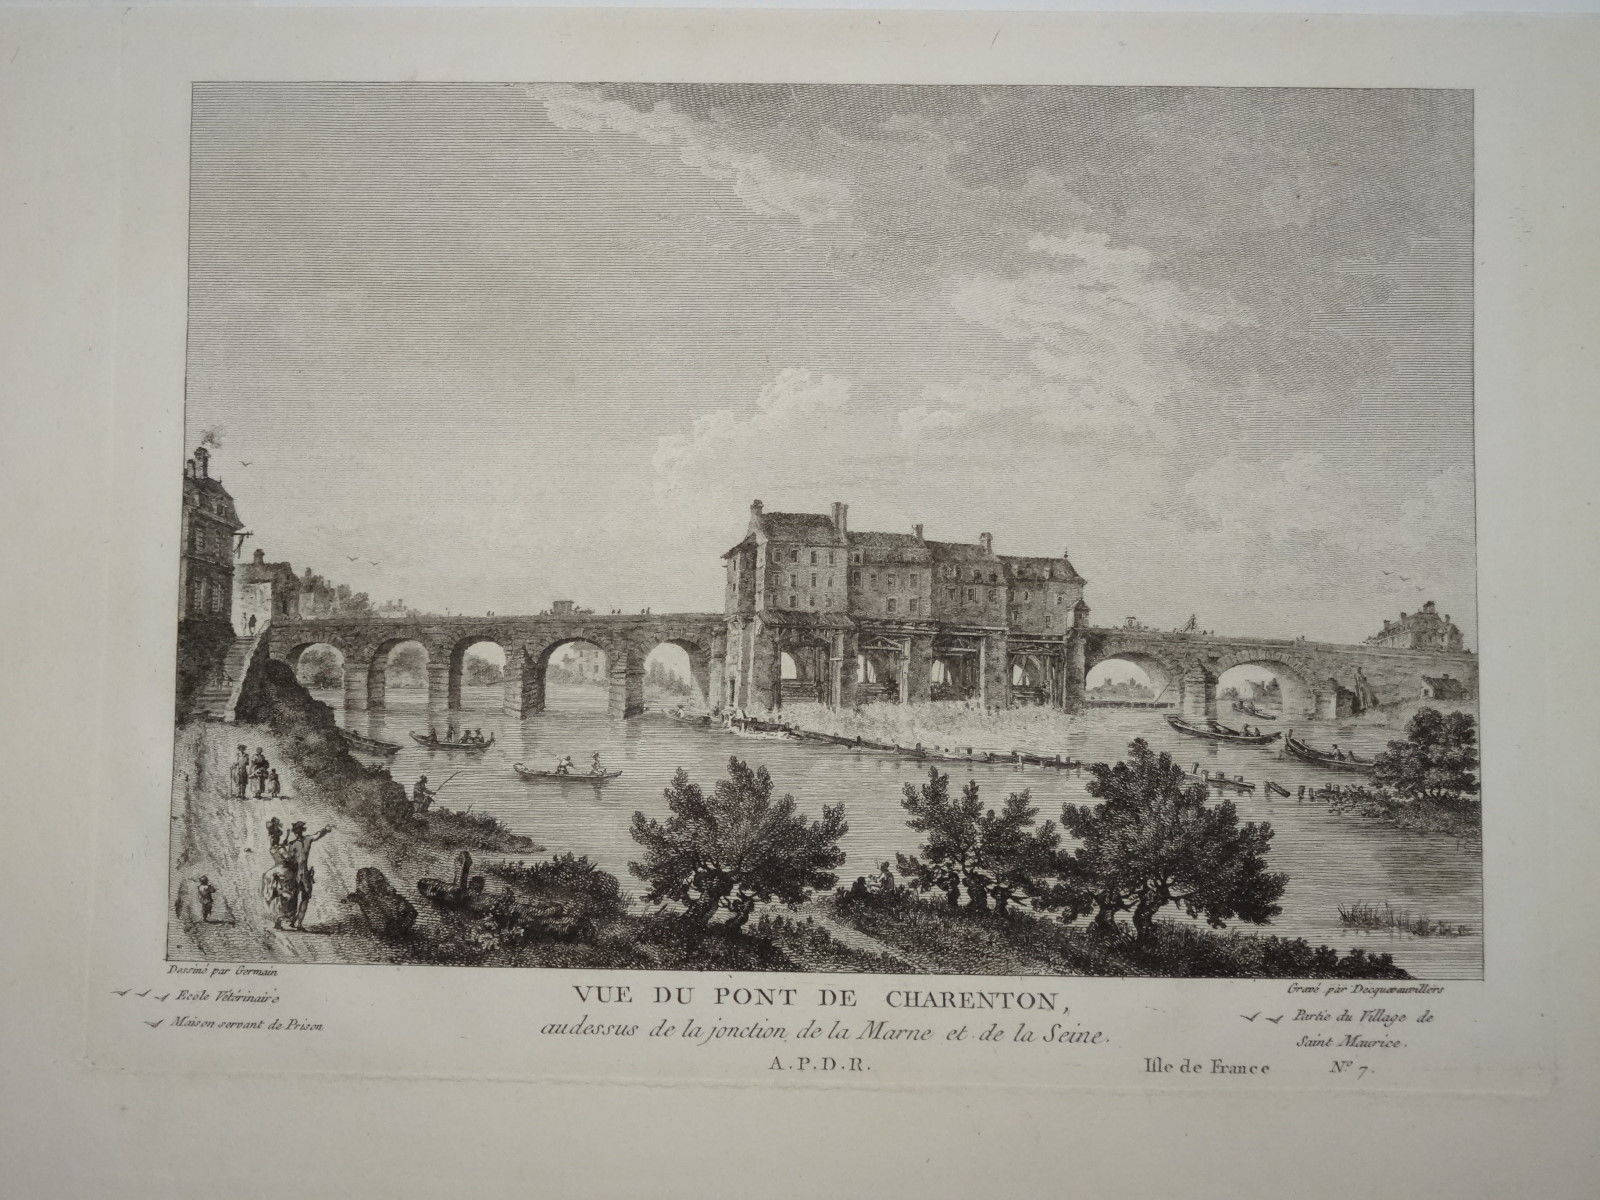 pont-de-charenton-dessin-germain-graveur-decquevauvillers-fin-xviiieme